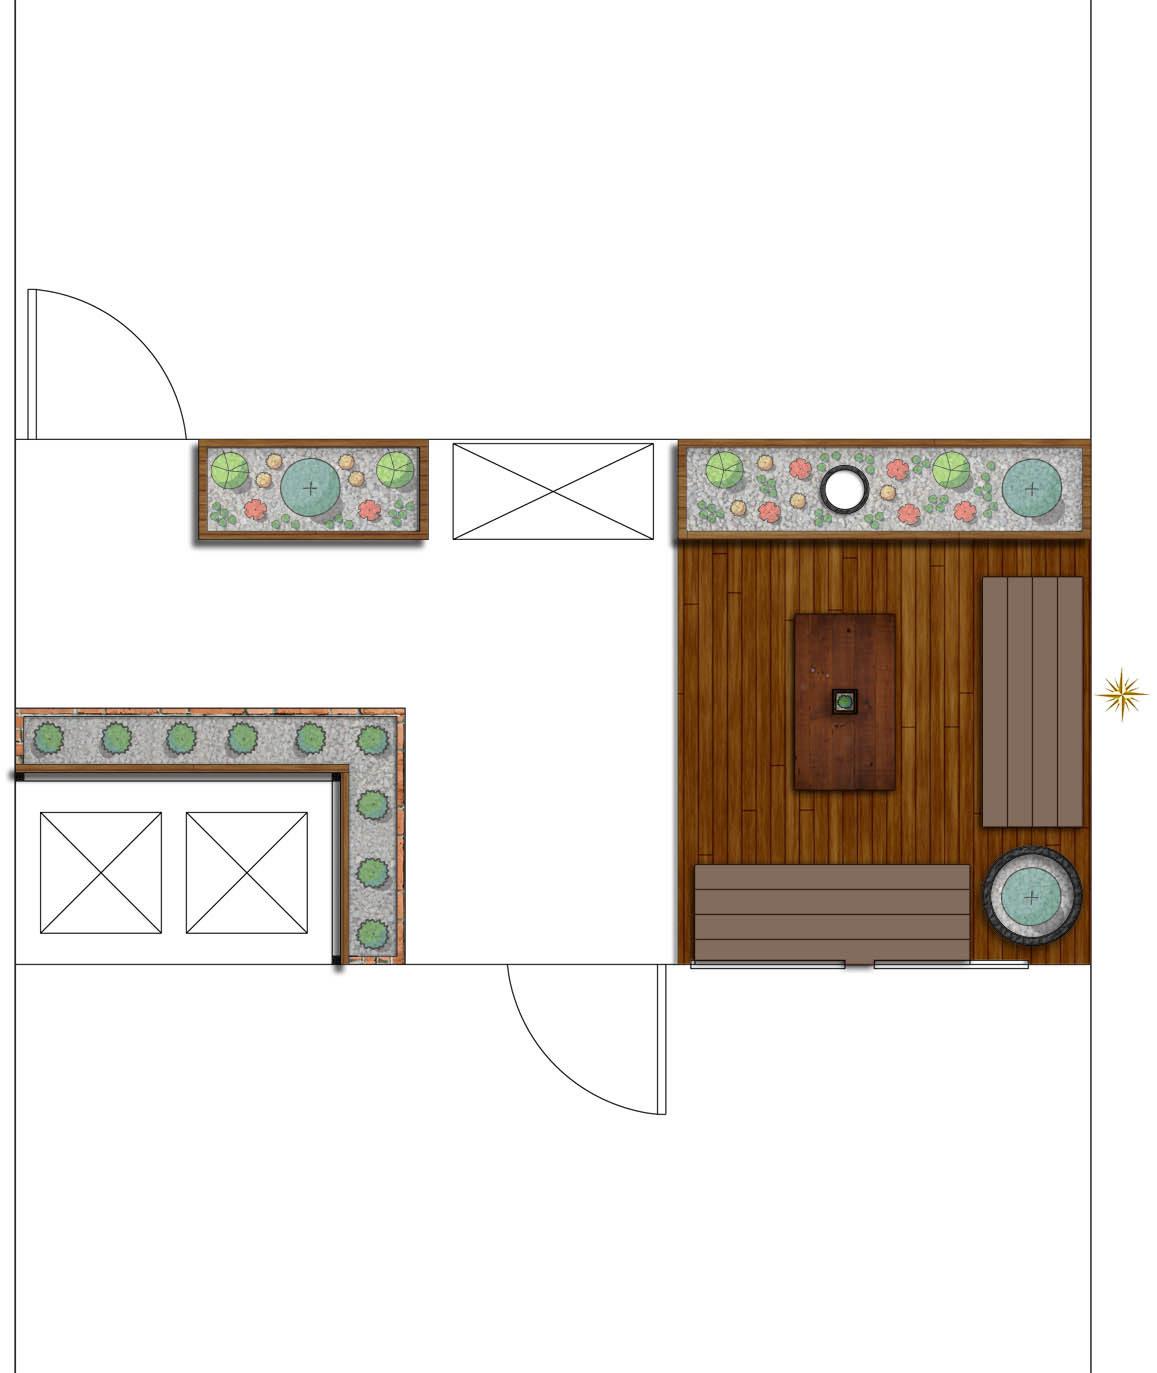 Tannenbaum Outdoor.Park Grove Patio Design Tannenbaum Design Group